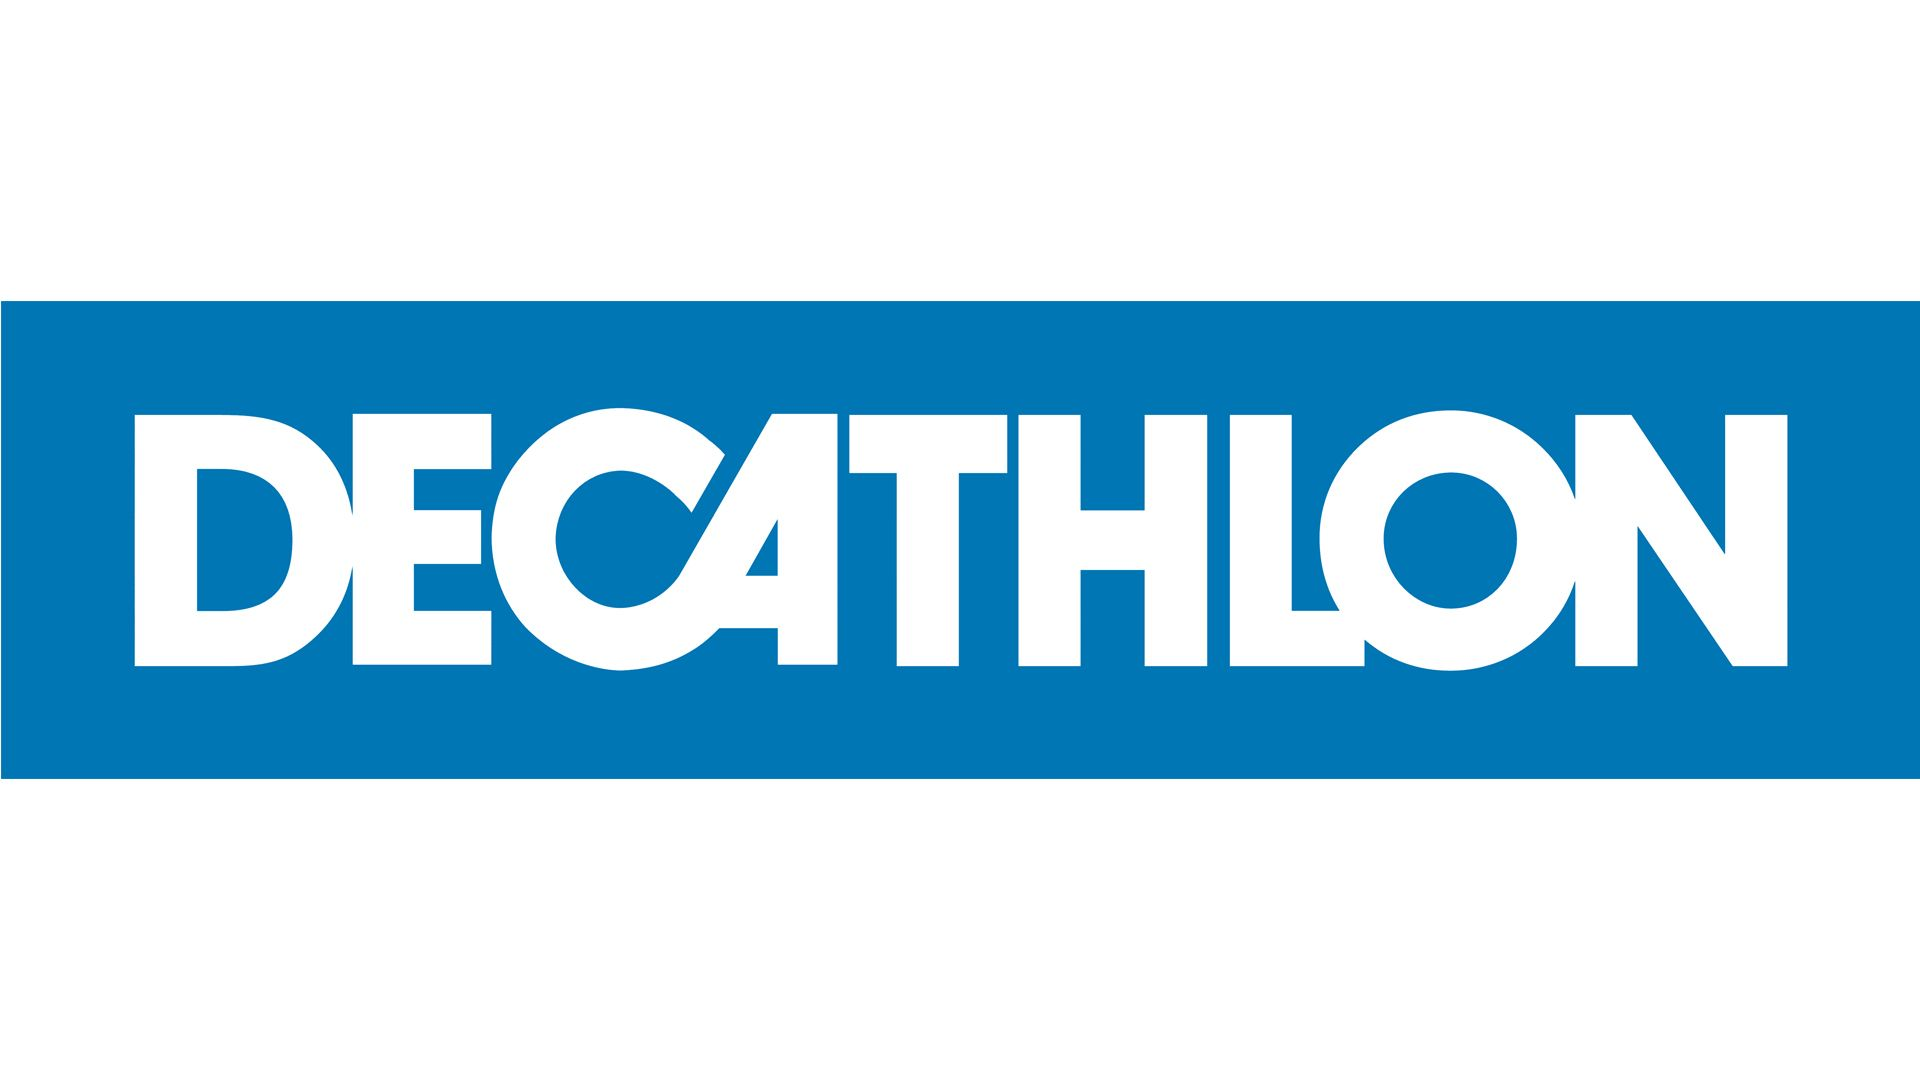 Meuble De Cuisine Decathlon decathlon - recherche google | décathlon, logos et article